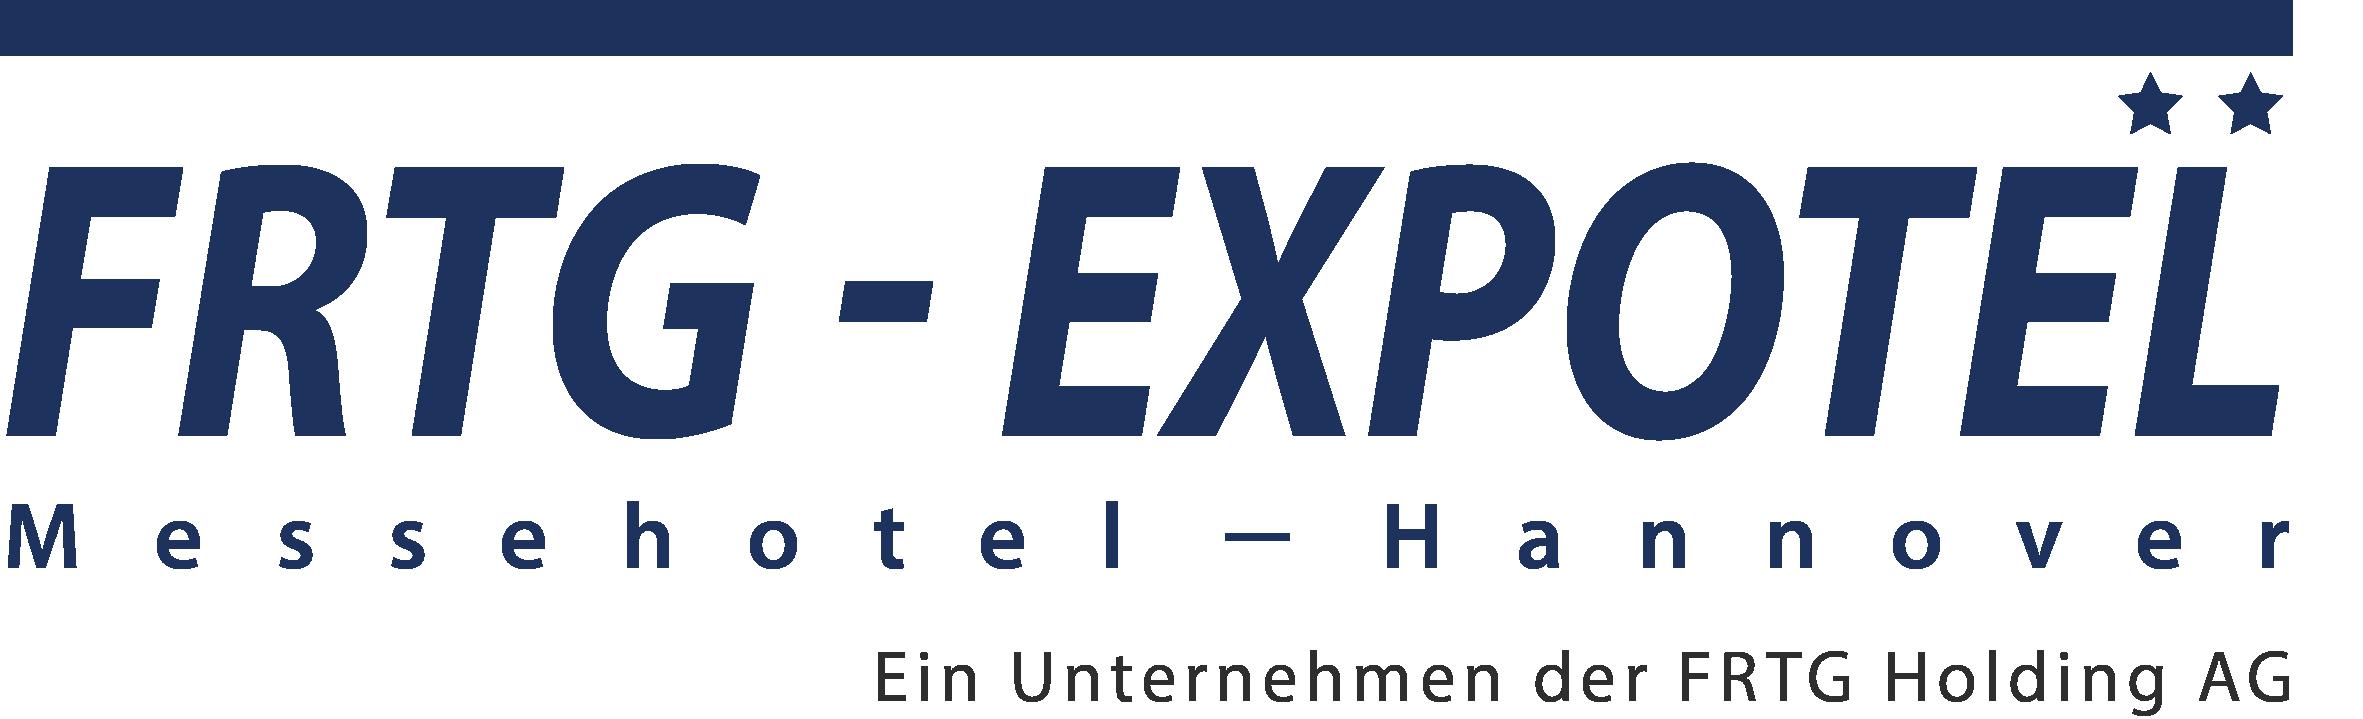 Messehotel FRTG Expotel Hannover